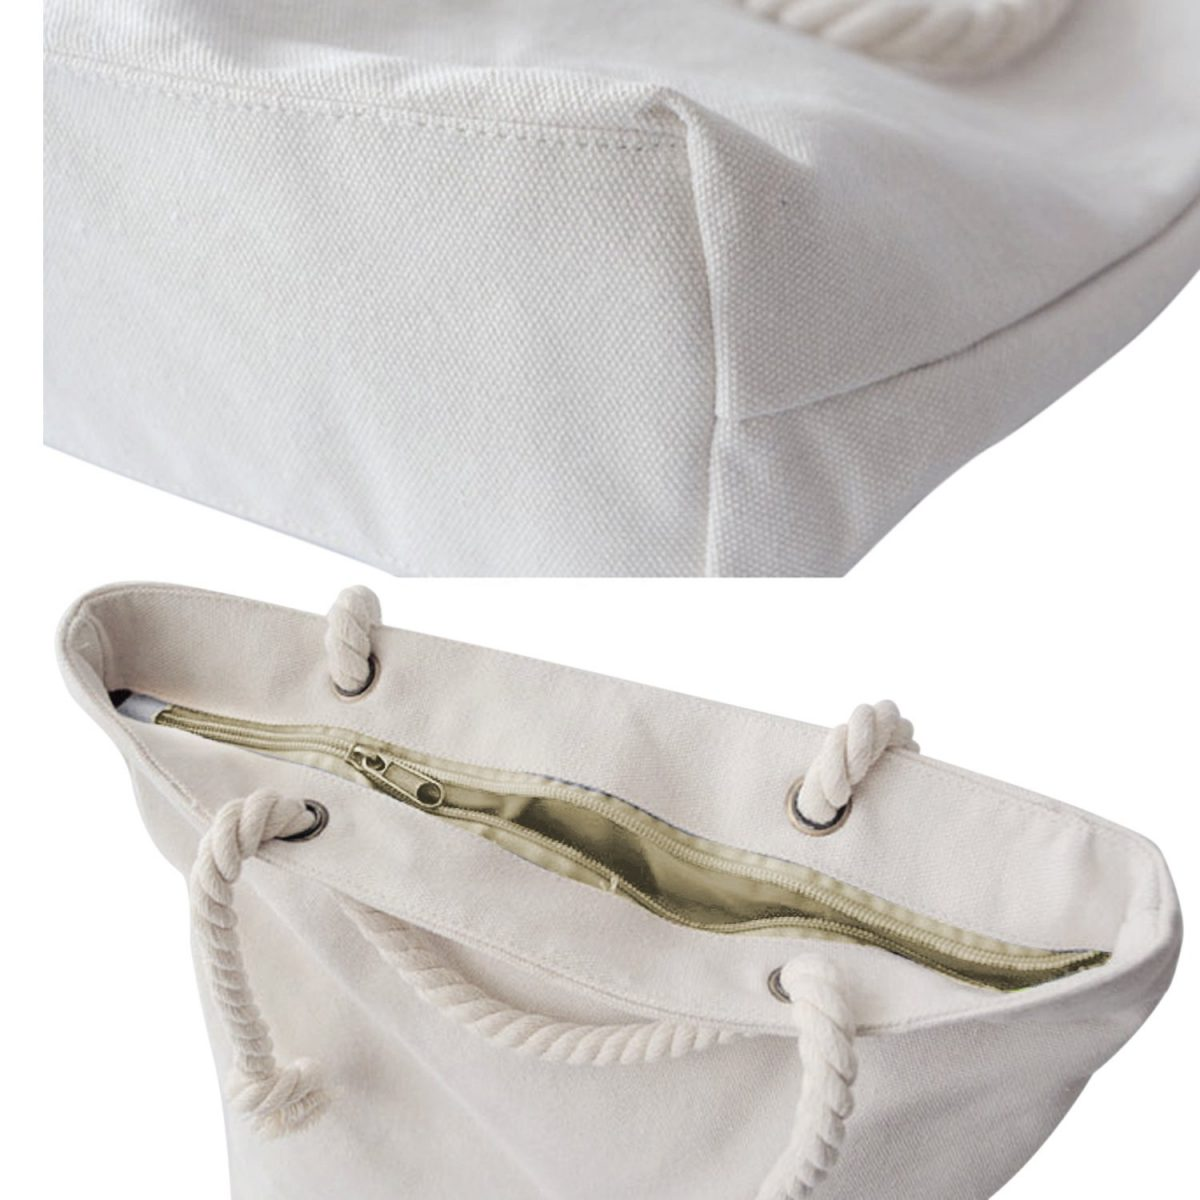 Kare Puanlı Kalp Kolye Motifli Fermuarlı Modern Kumaş Çanta Realhomes